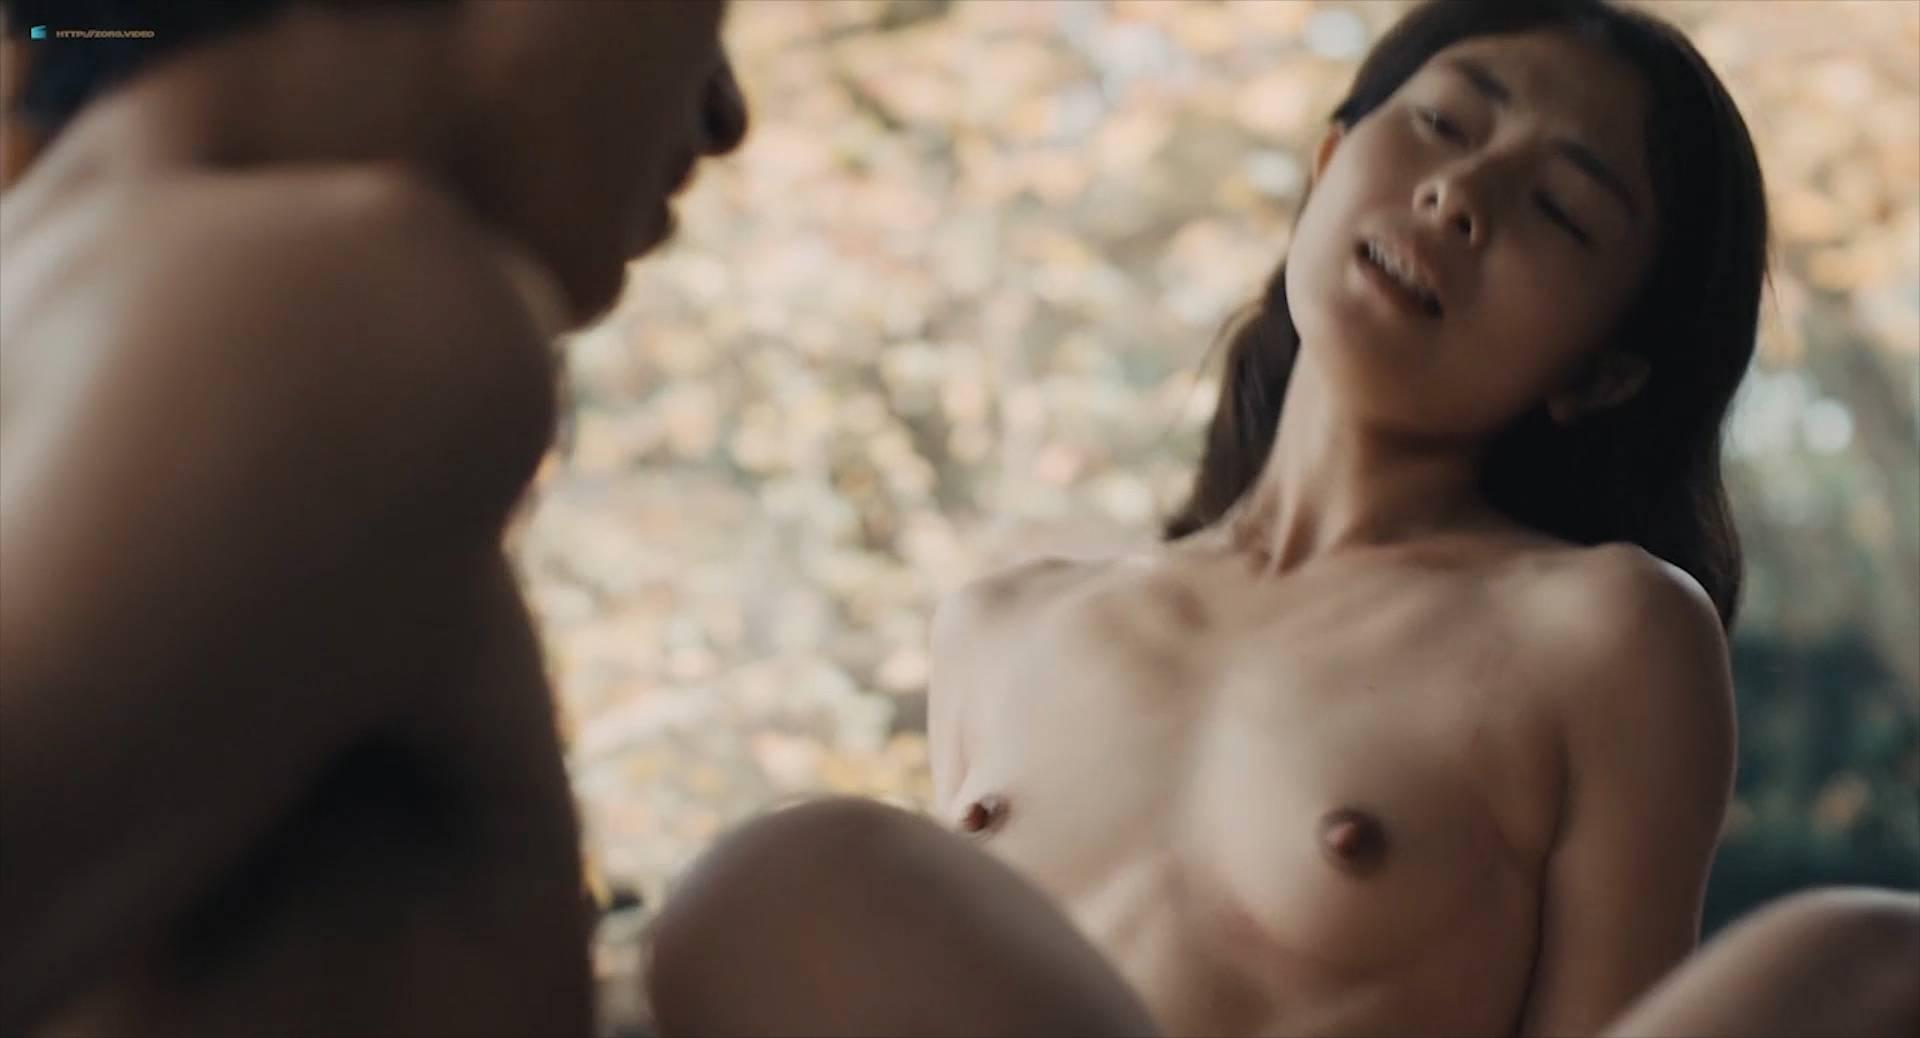 Kokone Sasaki nude hot sex Ayano Moriguchi and Aina Yamada all nude sex too - The Lowlife (JP-2017) HD 1080p (4)